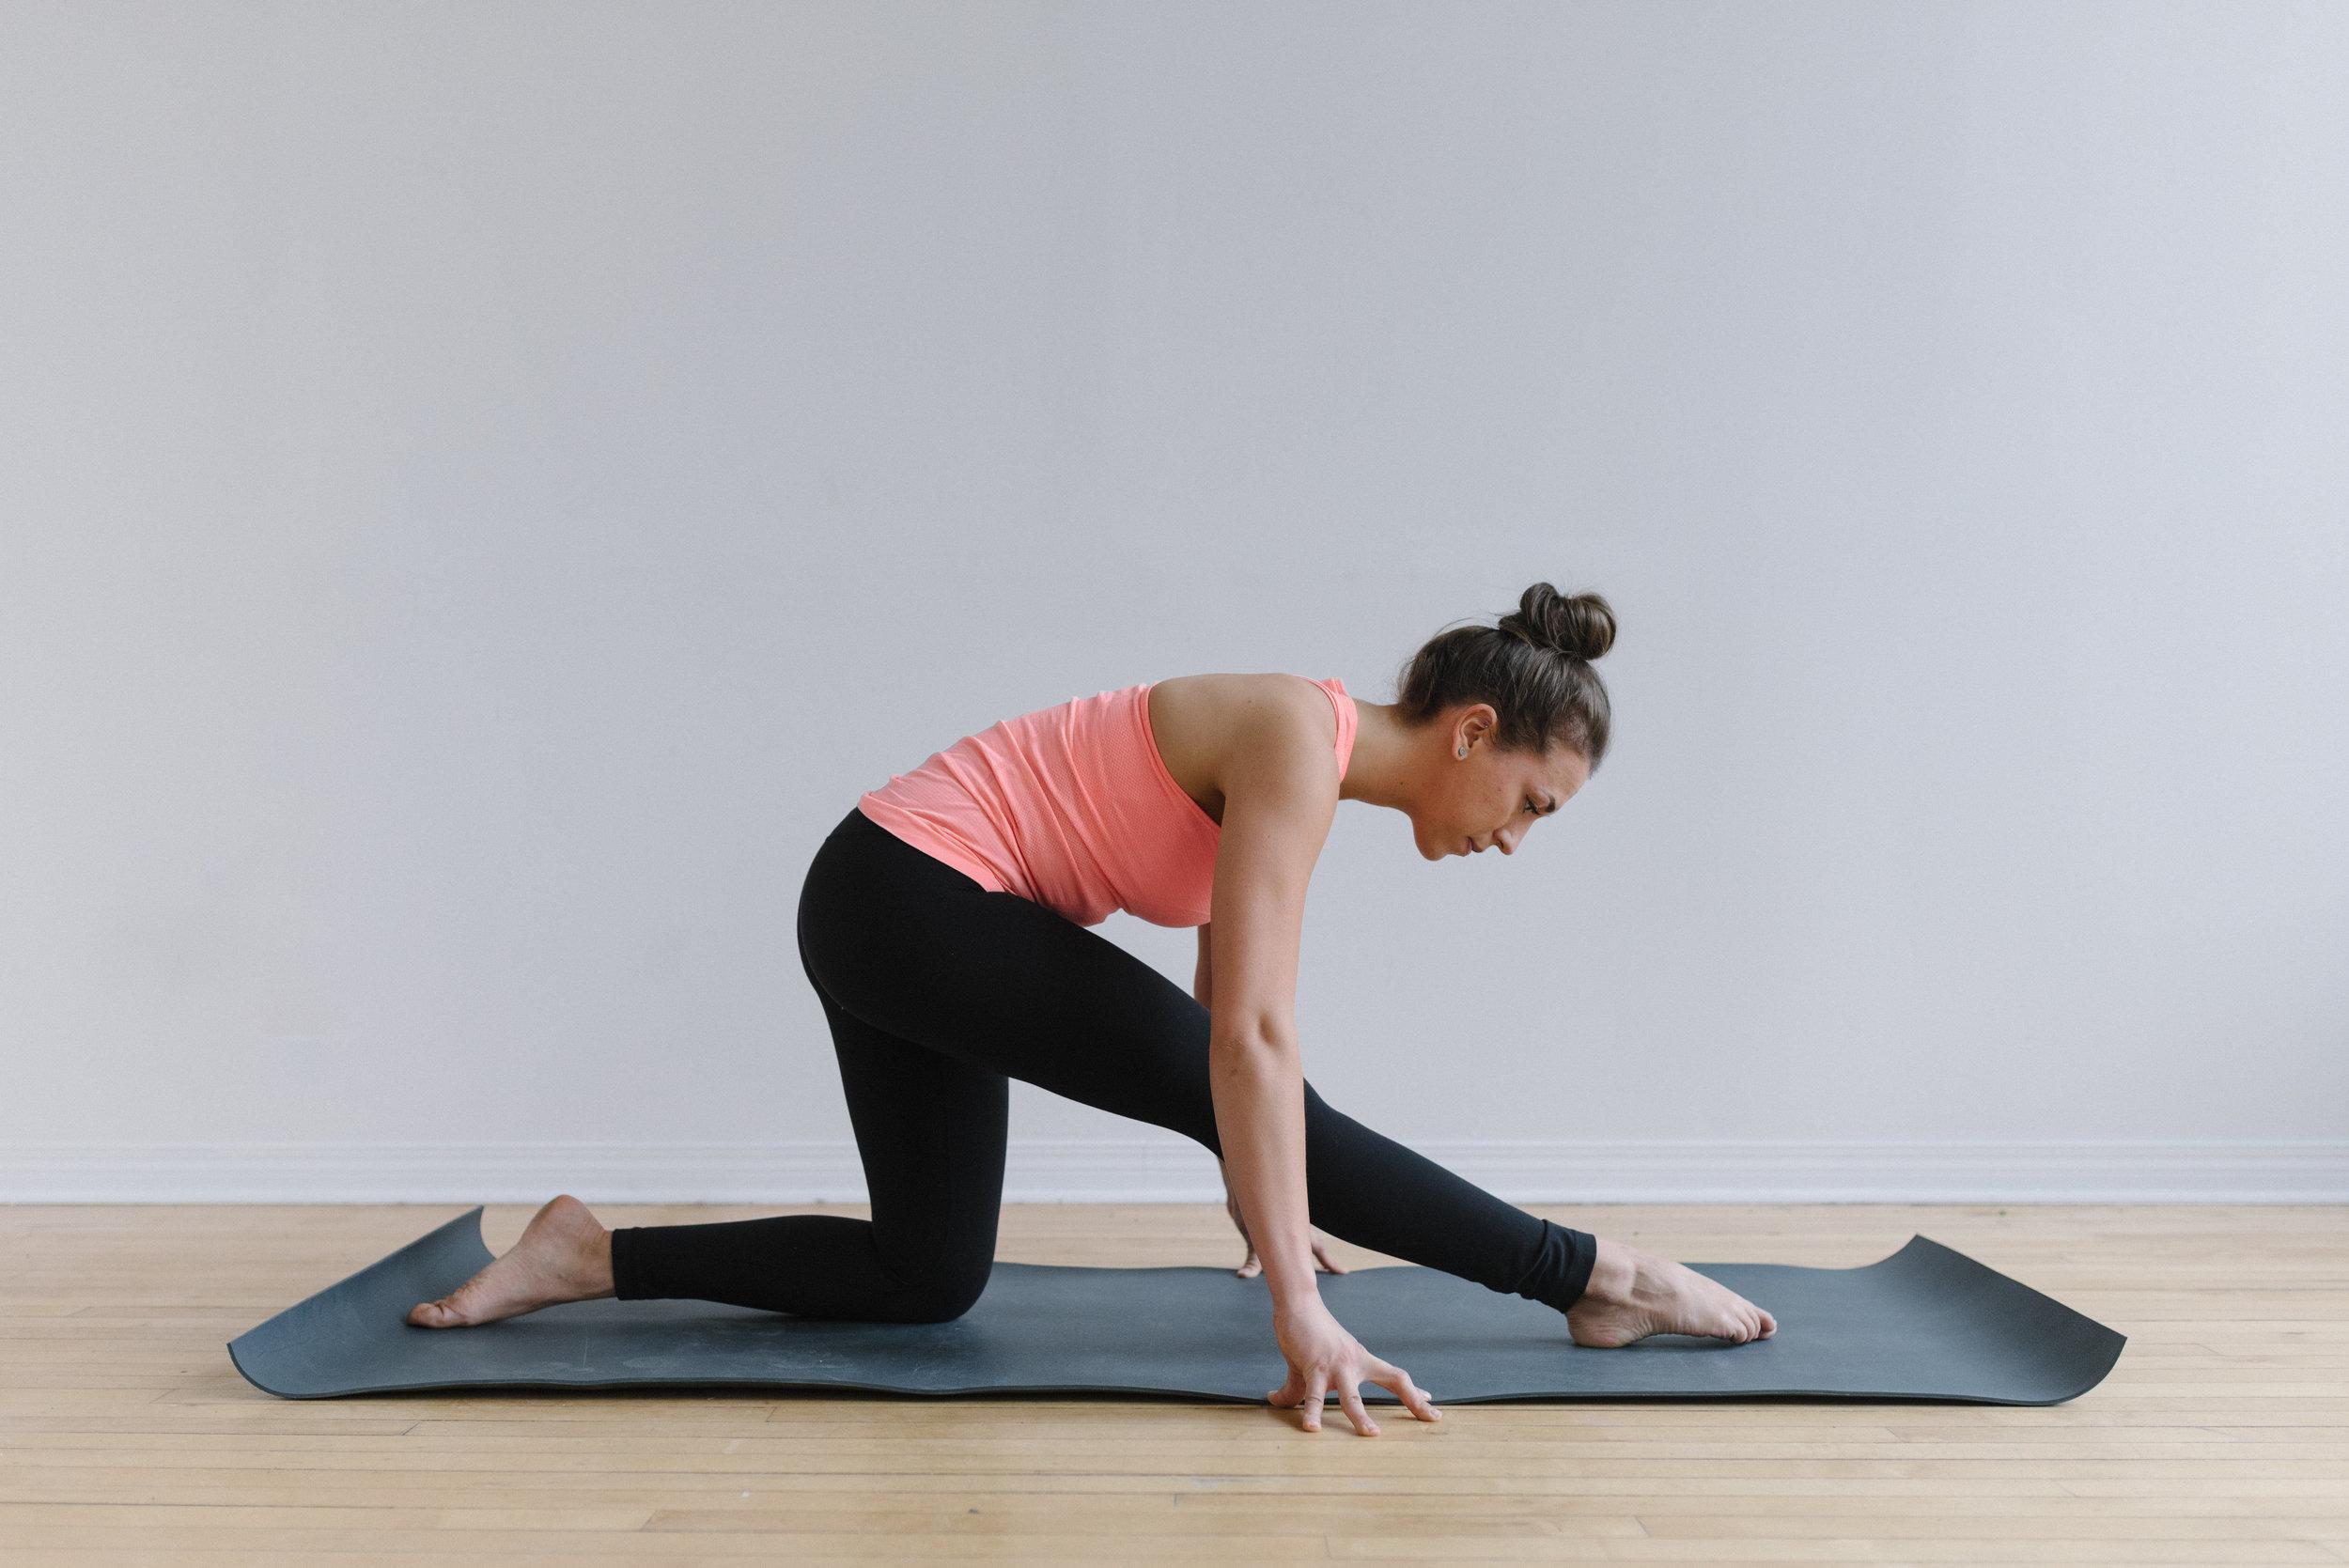 Sam D Squire | Yoga | Meditation | Splits | Yoga Pose | Yoga Sequence | At-Home Yoga